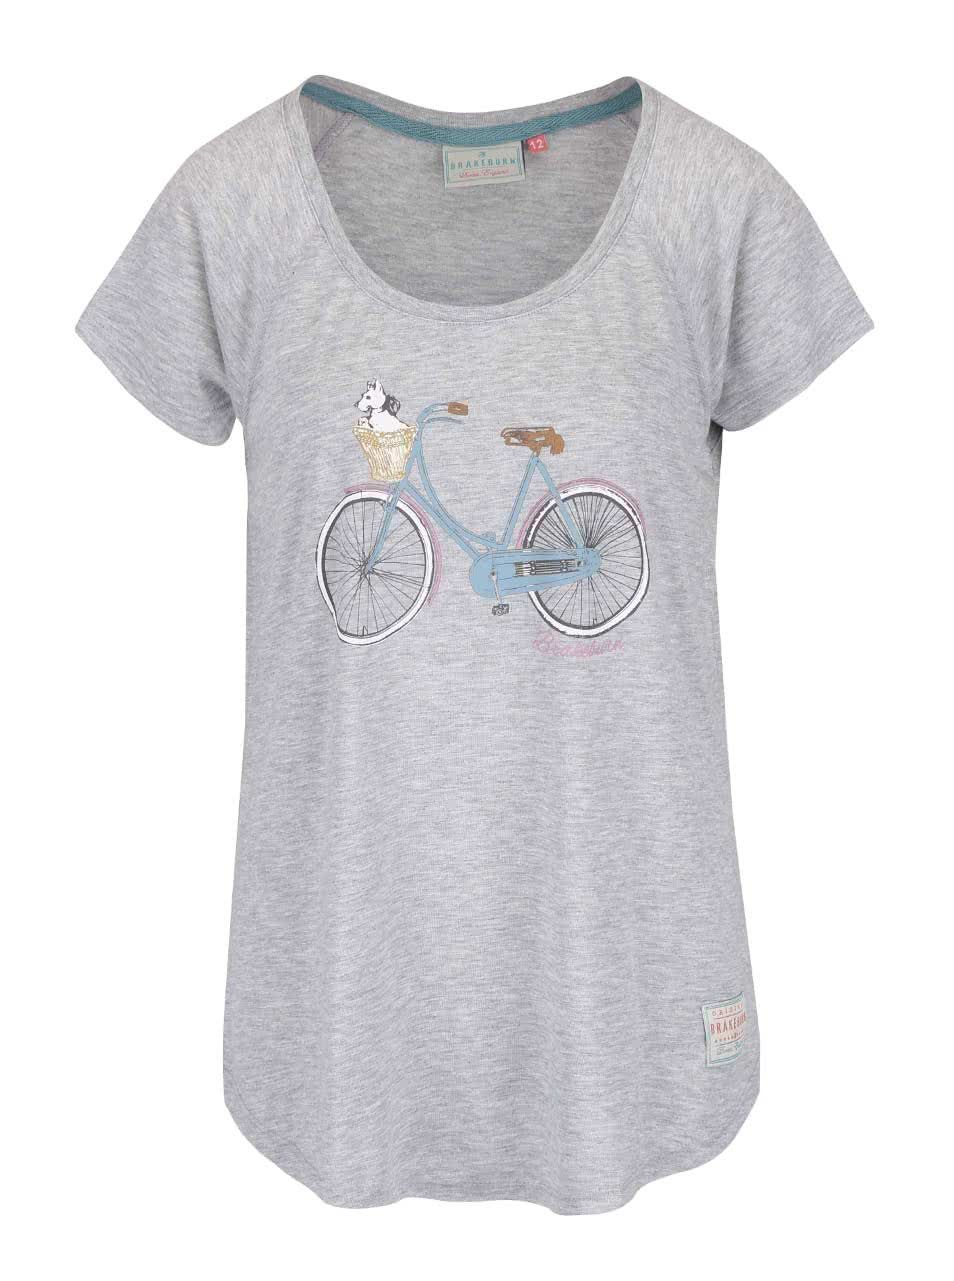 Sivé žíhané oversize tričko s potlačou Brakeburn Basket Bike ... 9f39cd97e18